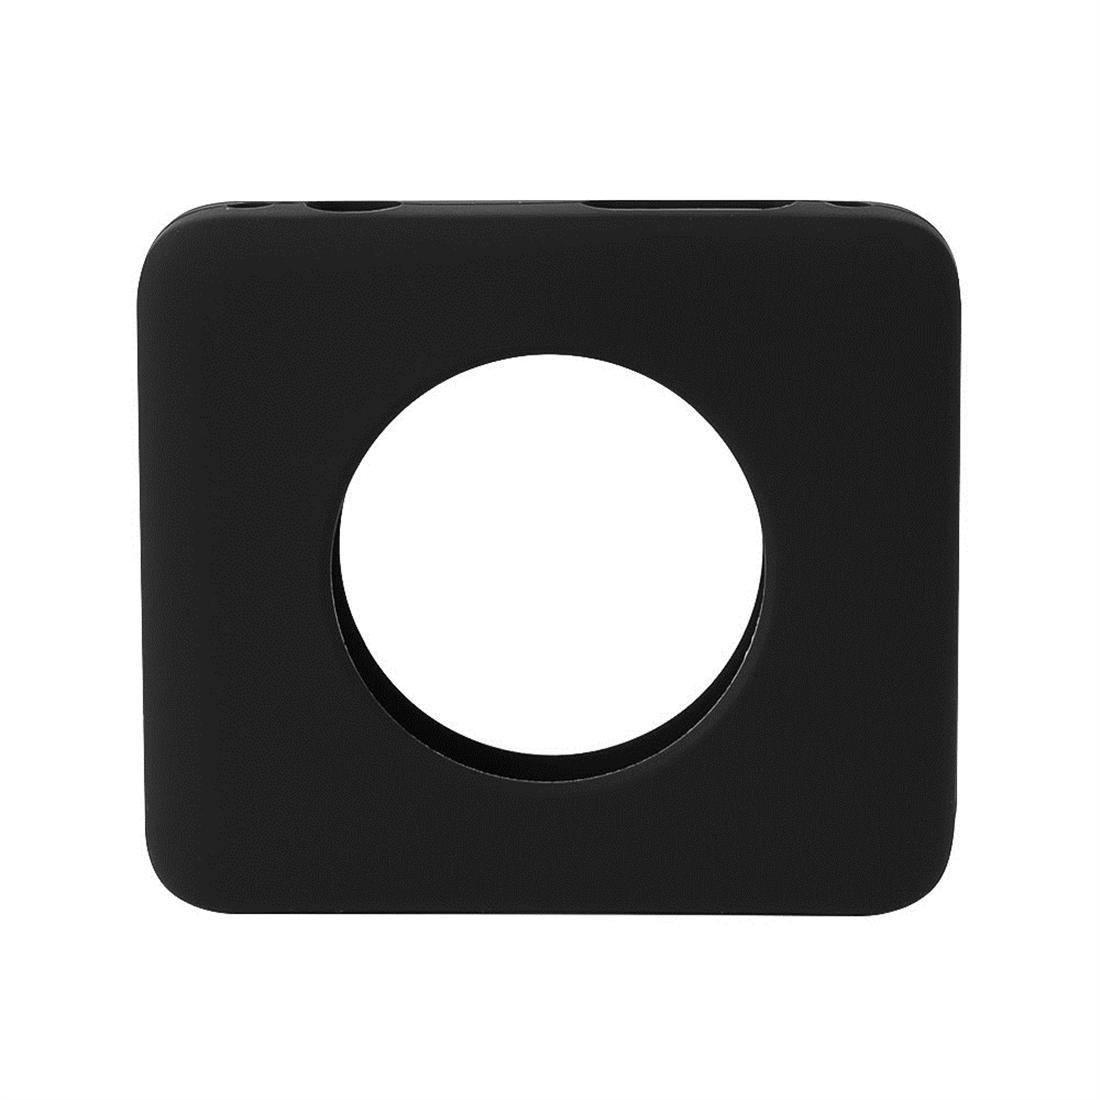 Silicon Cover Case Skin Cap Protector for Xiaomi Mijia 360 Panoramic Camera